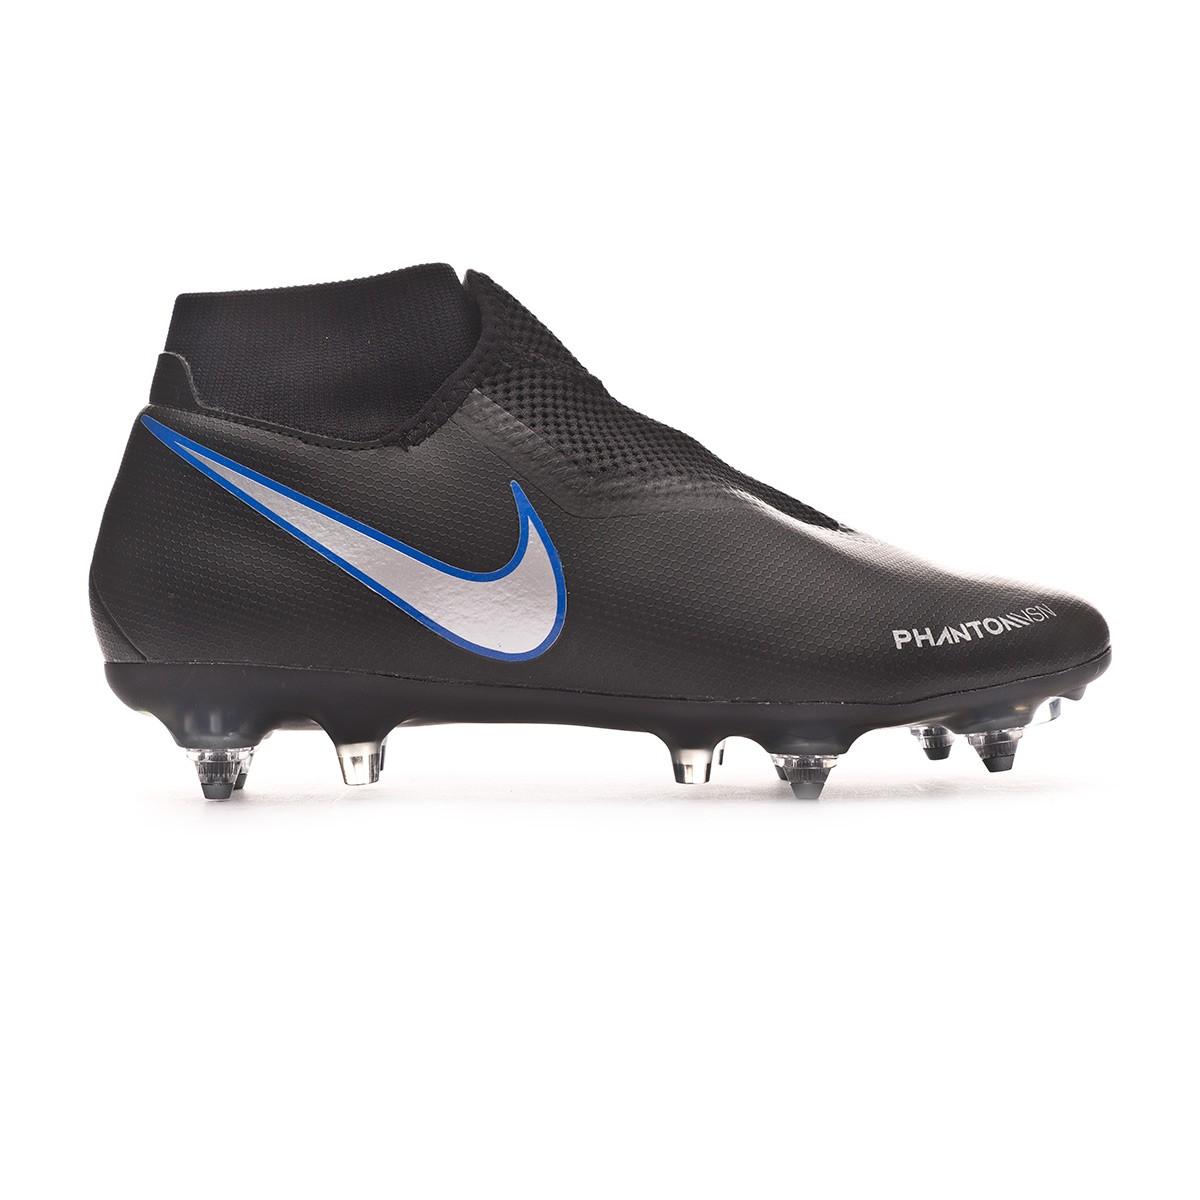 b139b4f3e0b9 Football Boots Nike Phantom Vision Academy DF ACC SG-Pro Black-Metallic  silver-Racer blue - Tienda de fútbol Fútbol Emotion